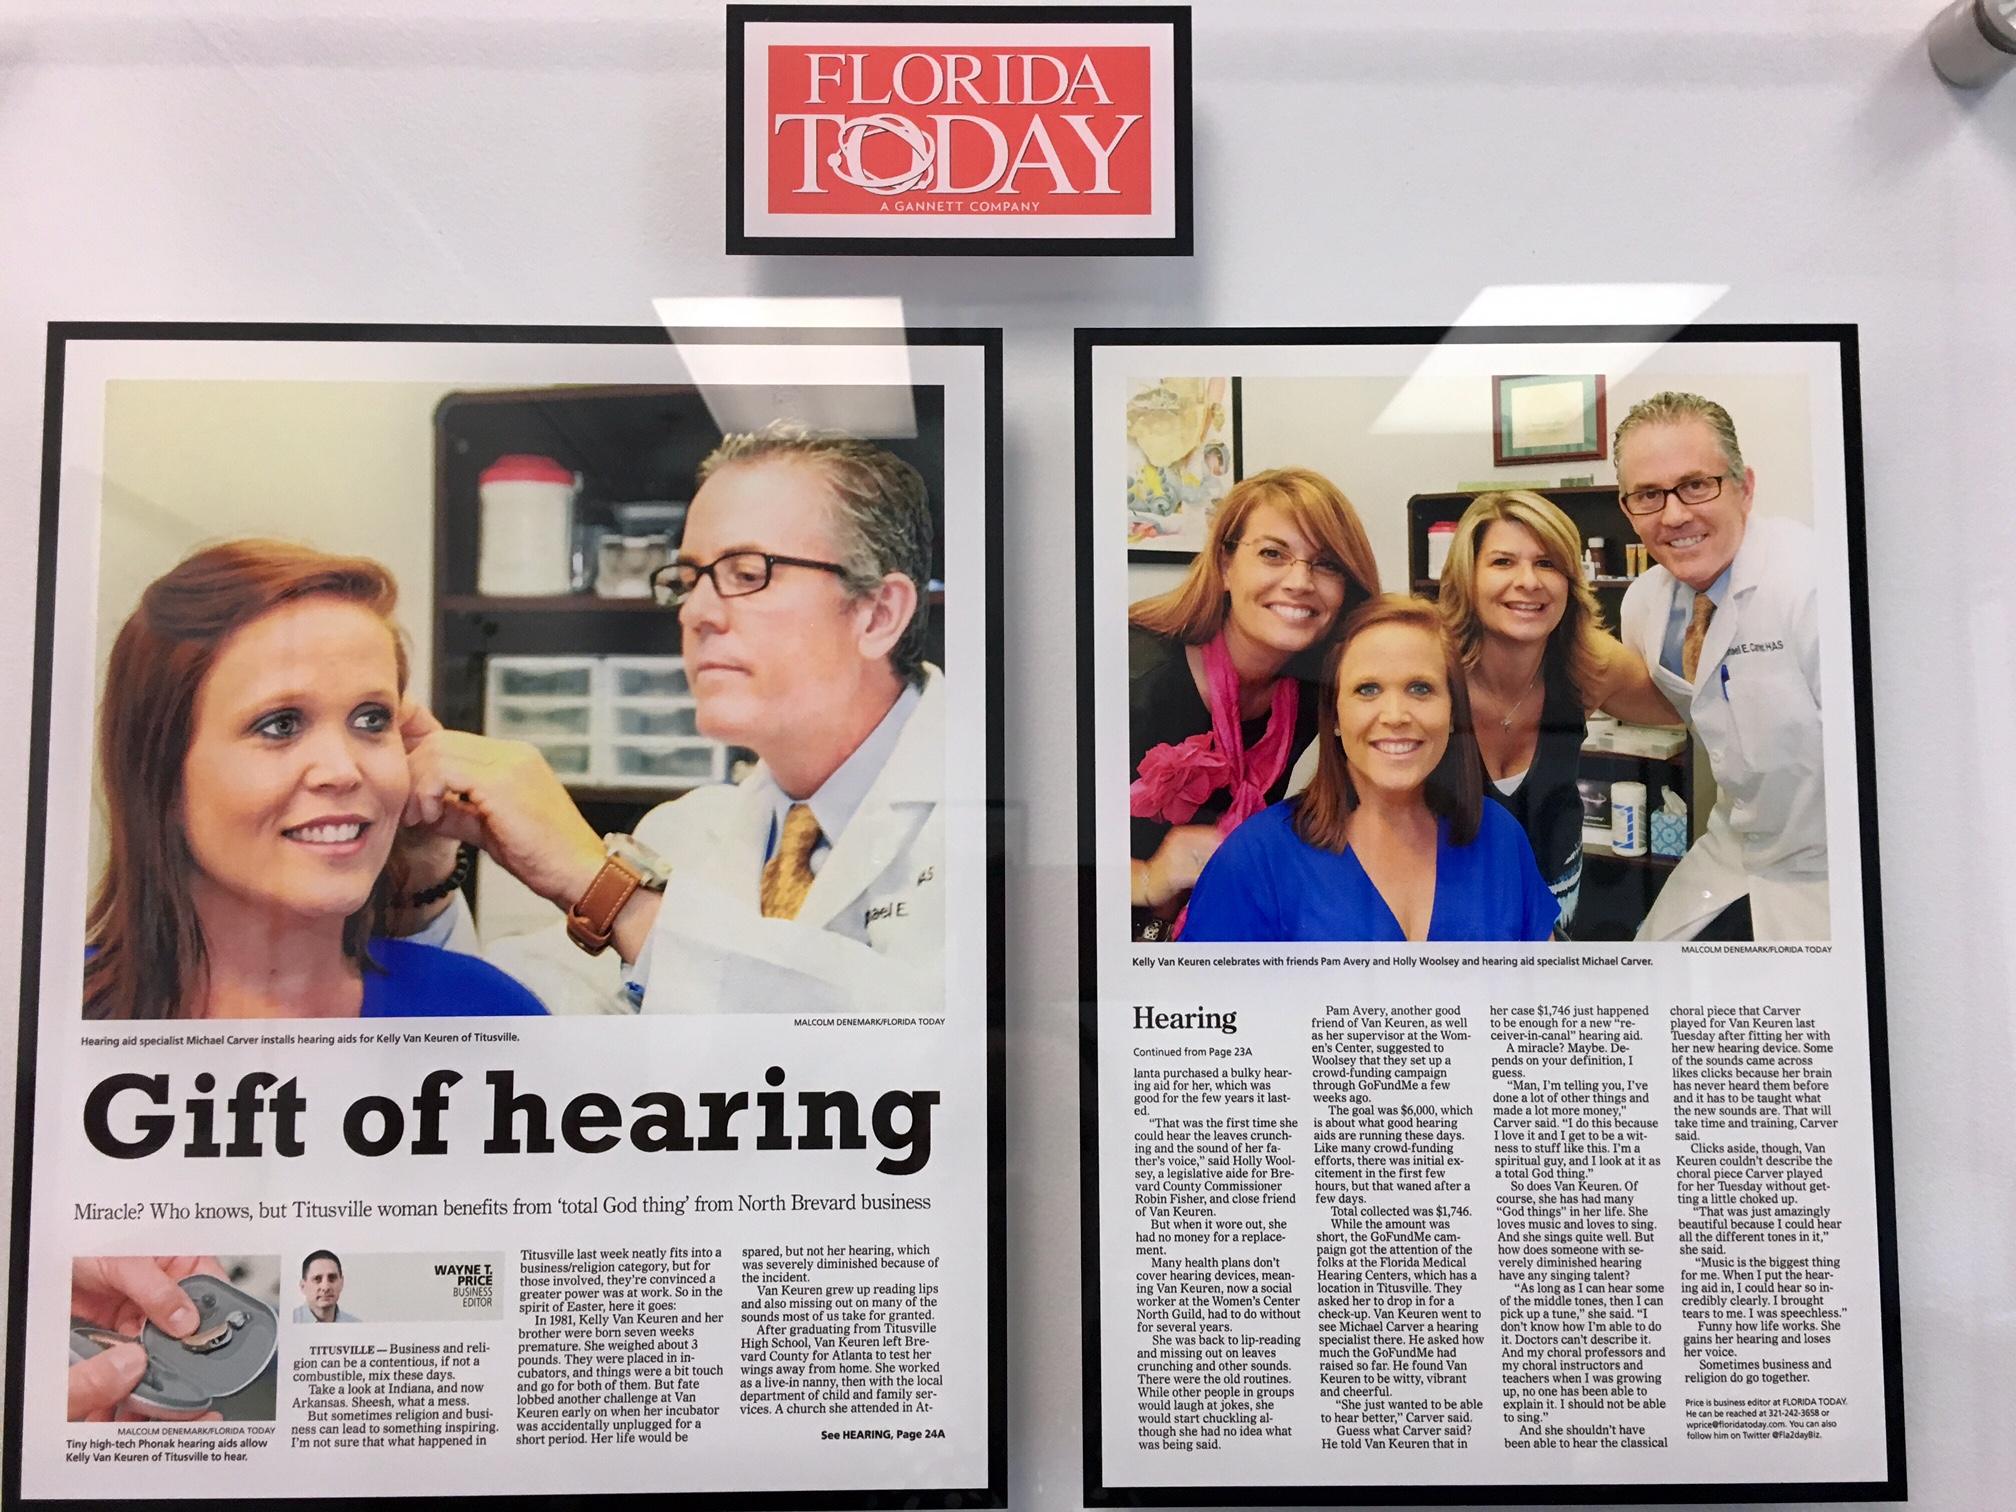 Florida Medical Hearing Centers image 10